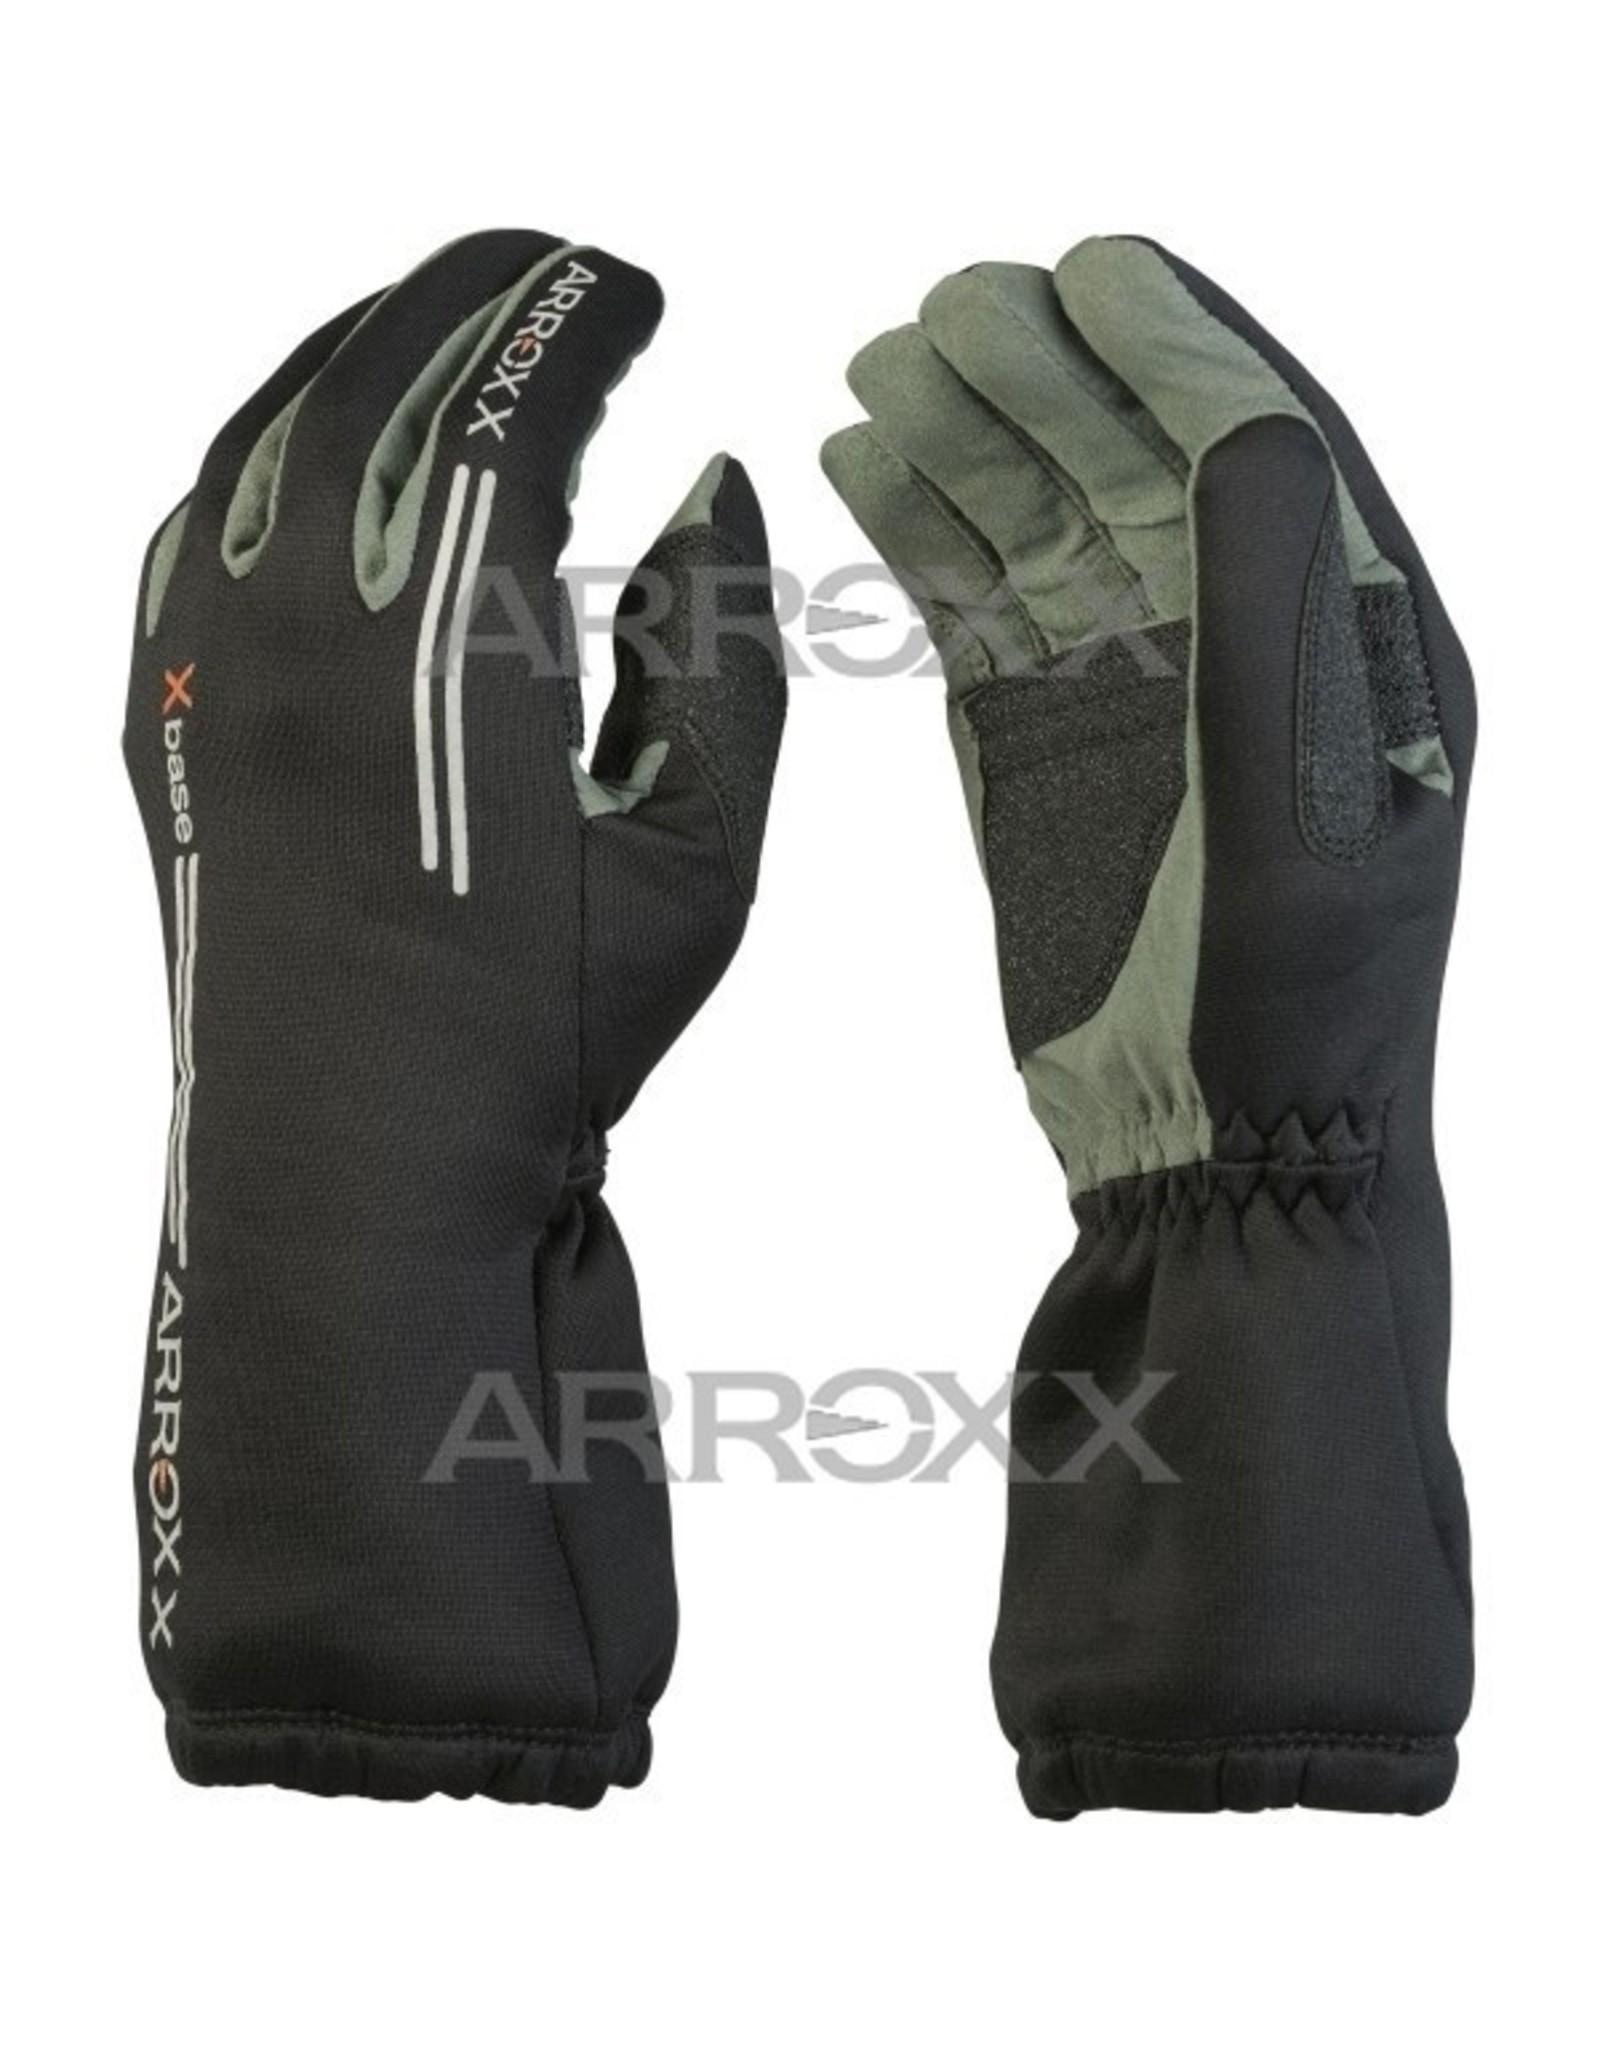 Arroxx Arroxx handschoenen Xbase zwart